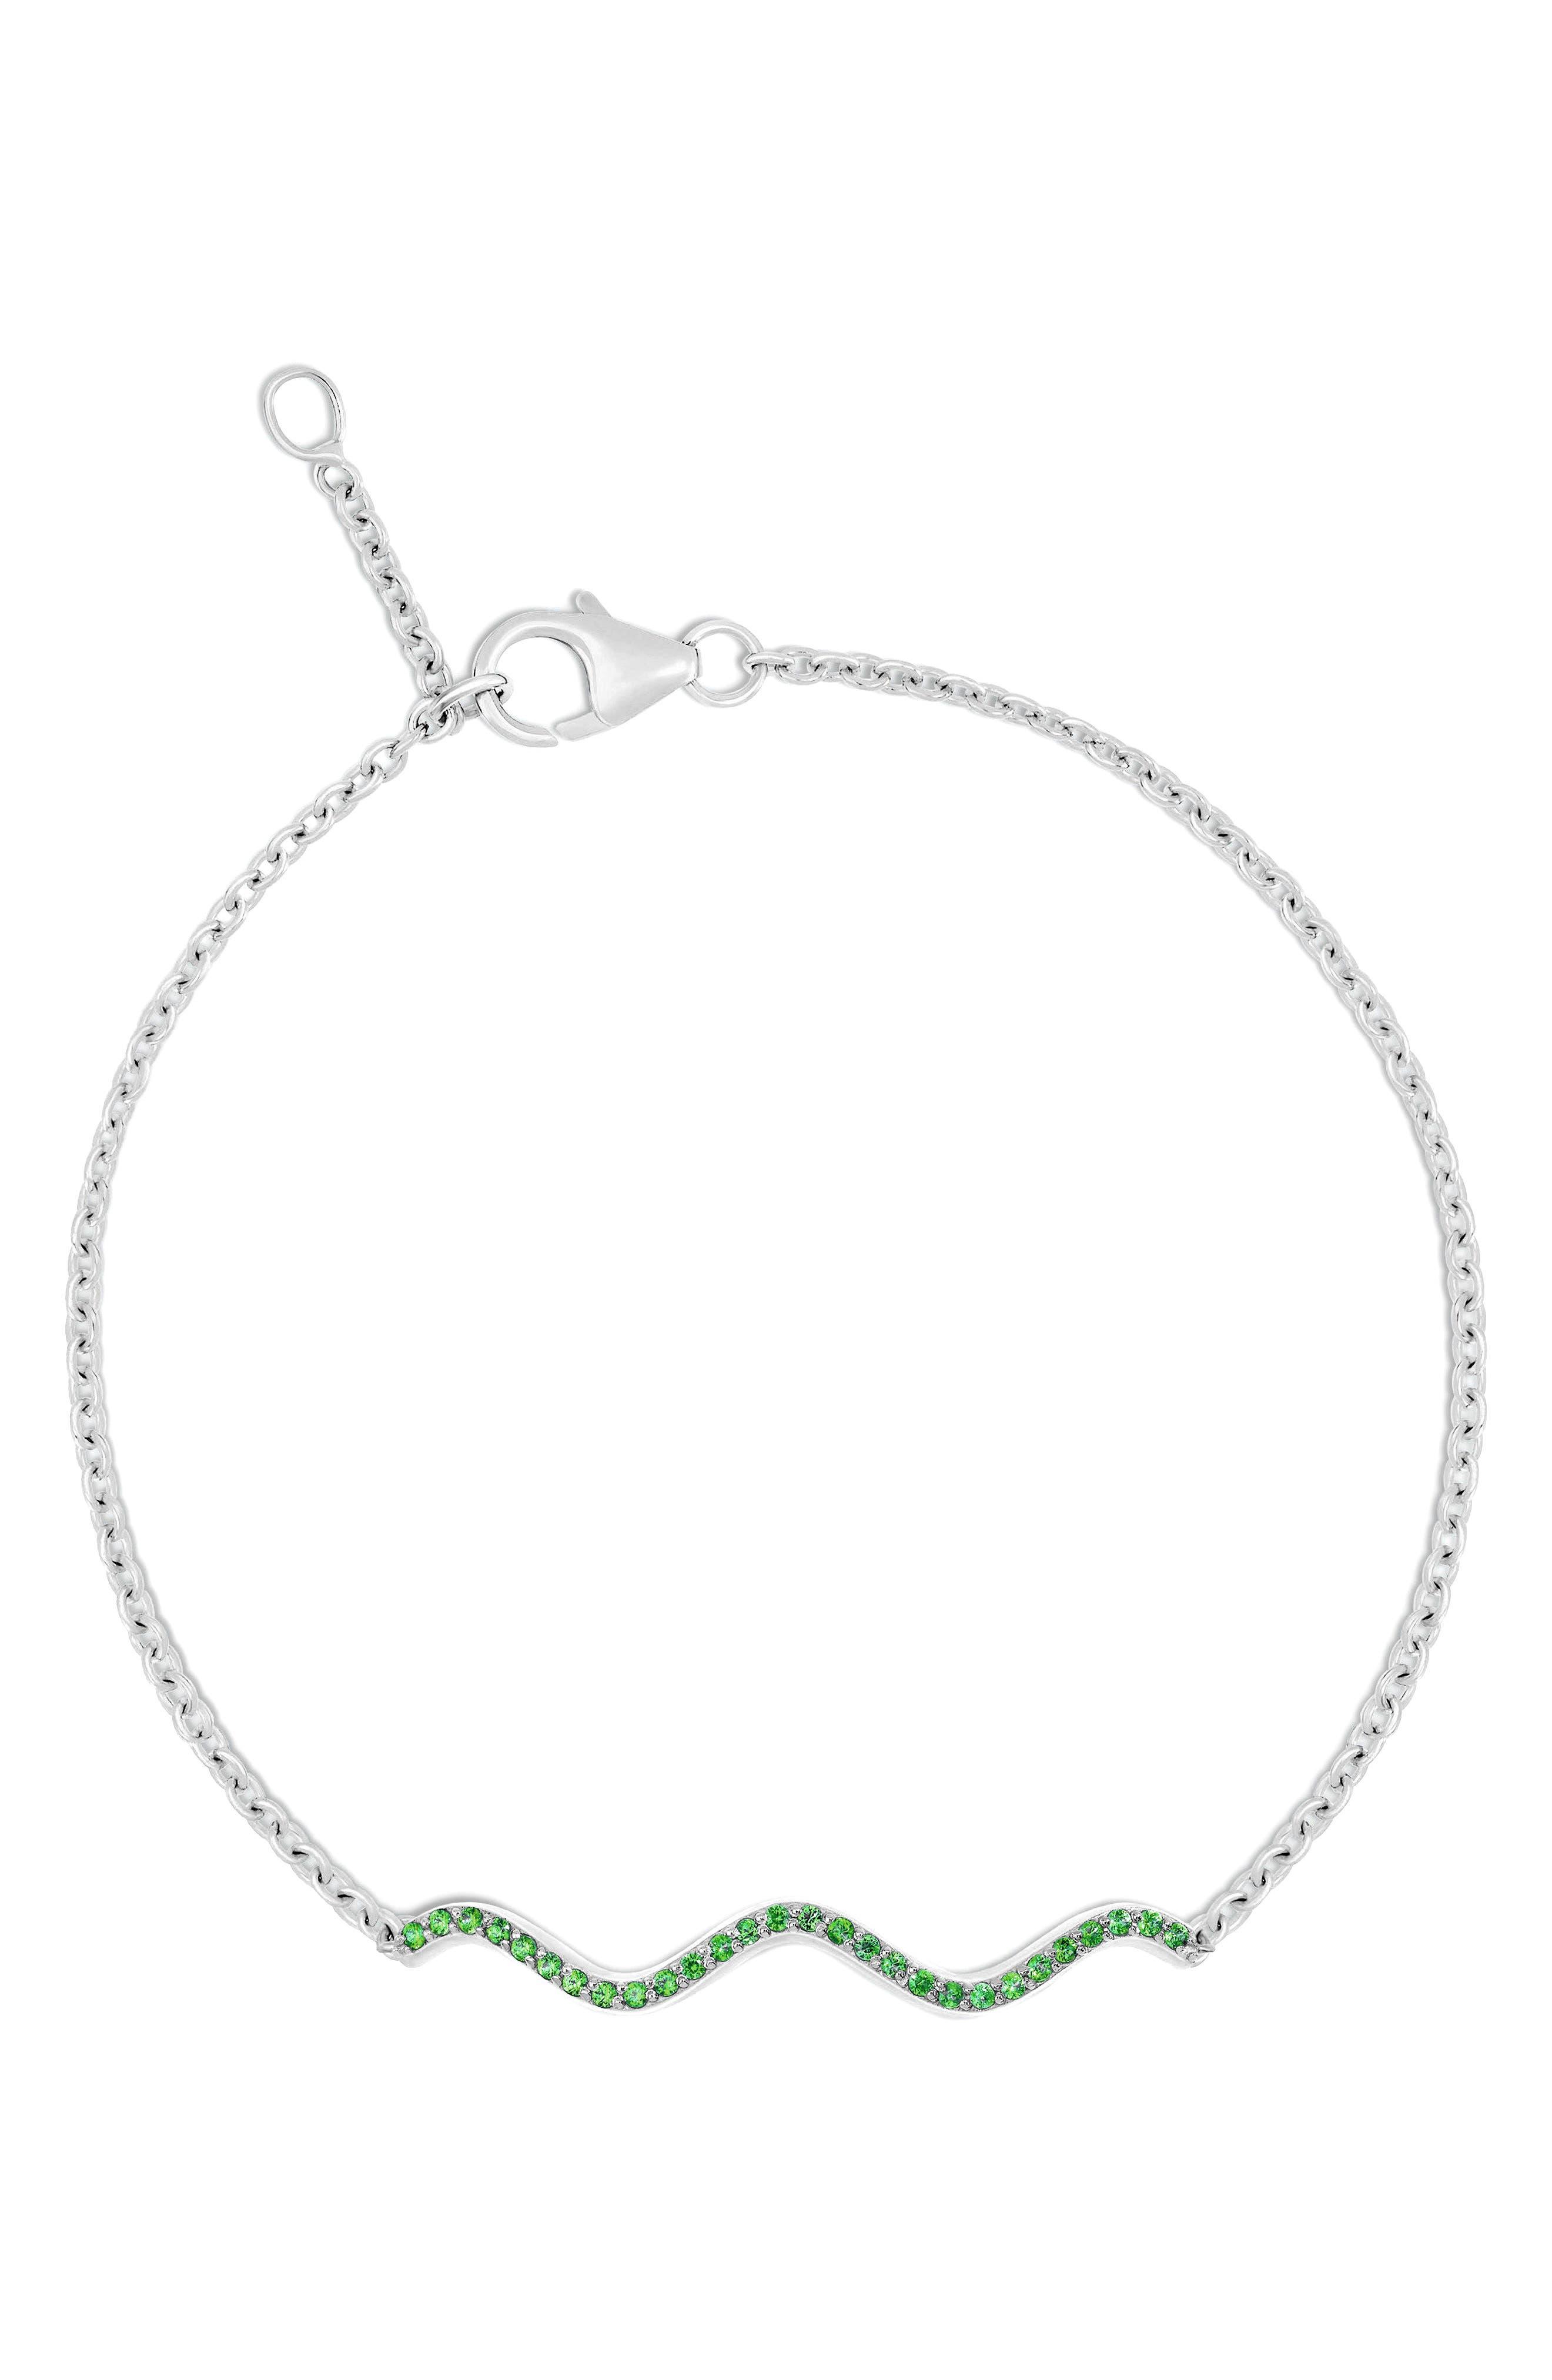 Memphis Chained Wave Tsavorite Bracelet,                             Main thumbnail 1, color,                             WHITE GOLD